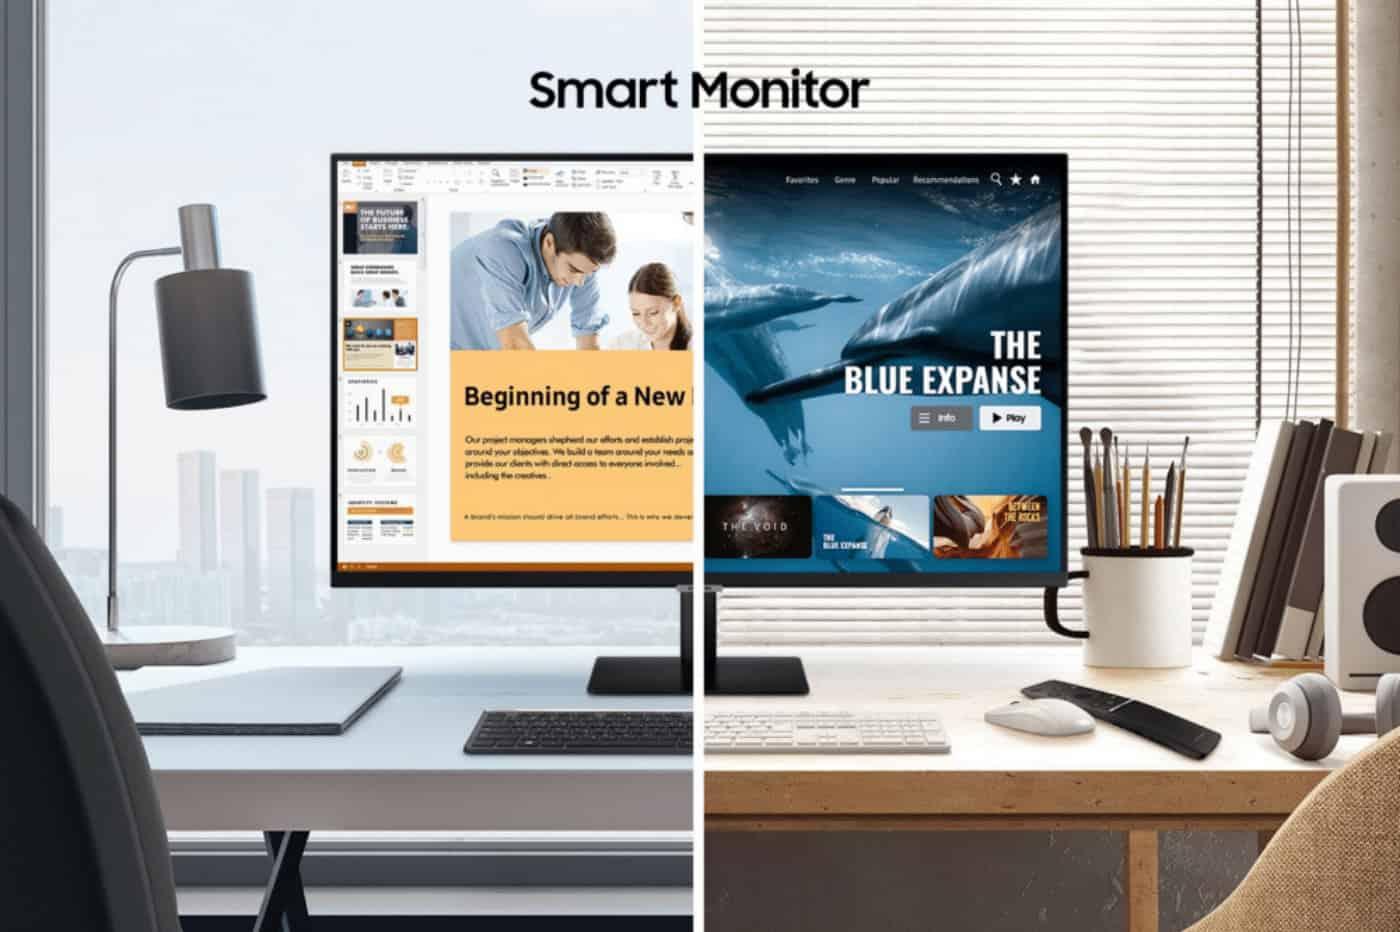 Smart Monitor ecran pc samrt tv samsung